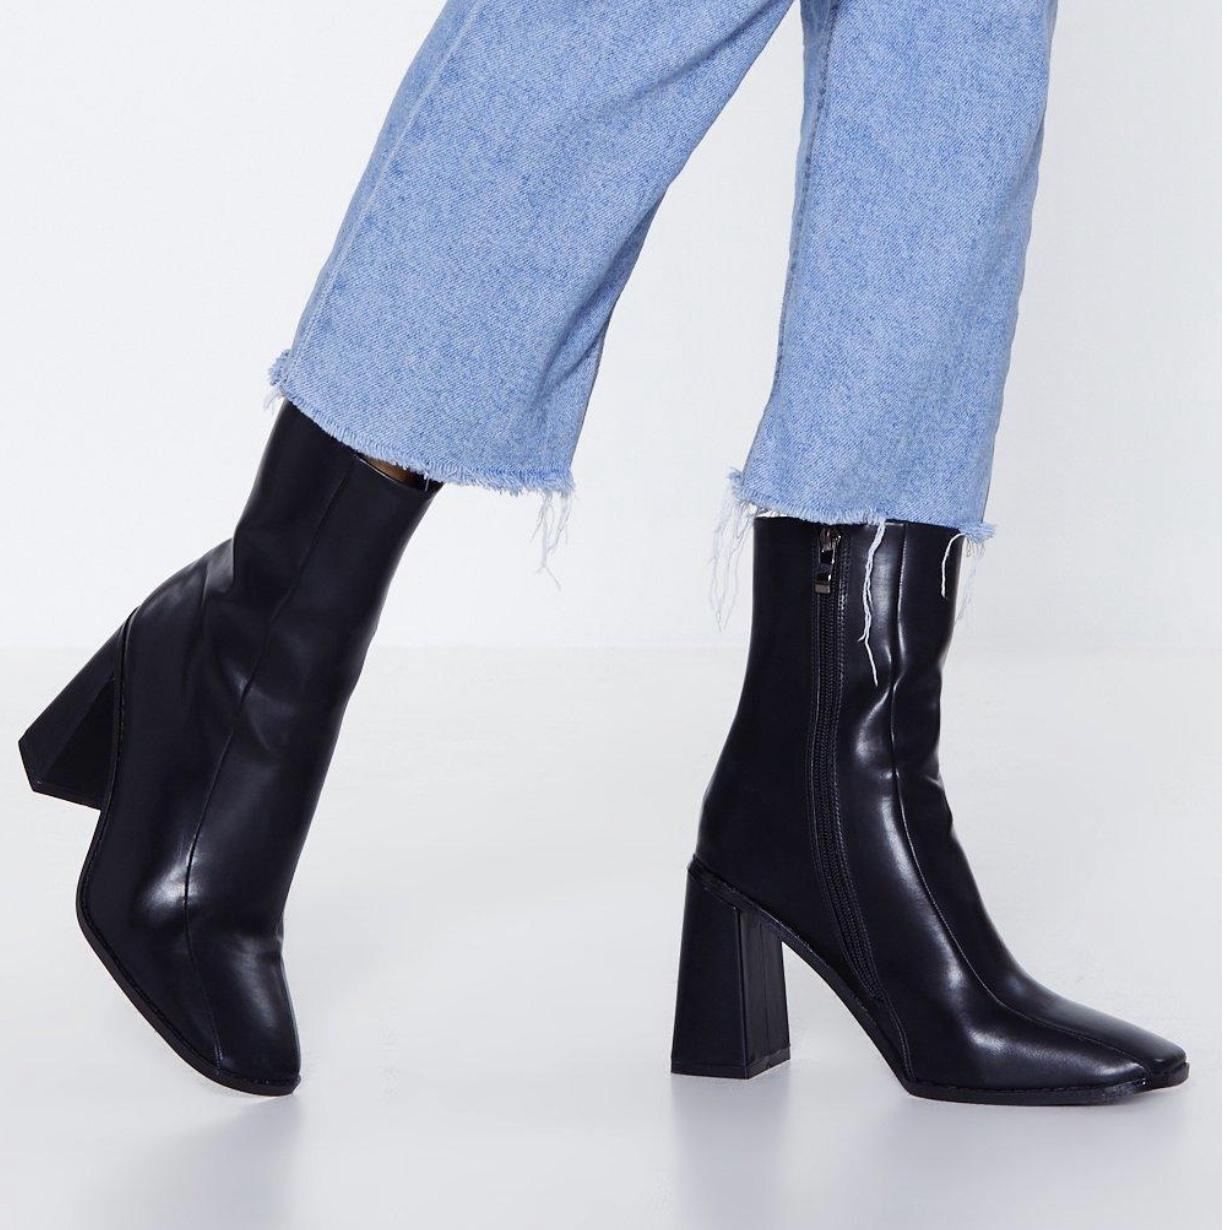 Dope Fashion Sense. Girl standing. black boots